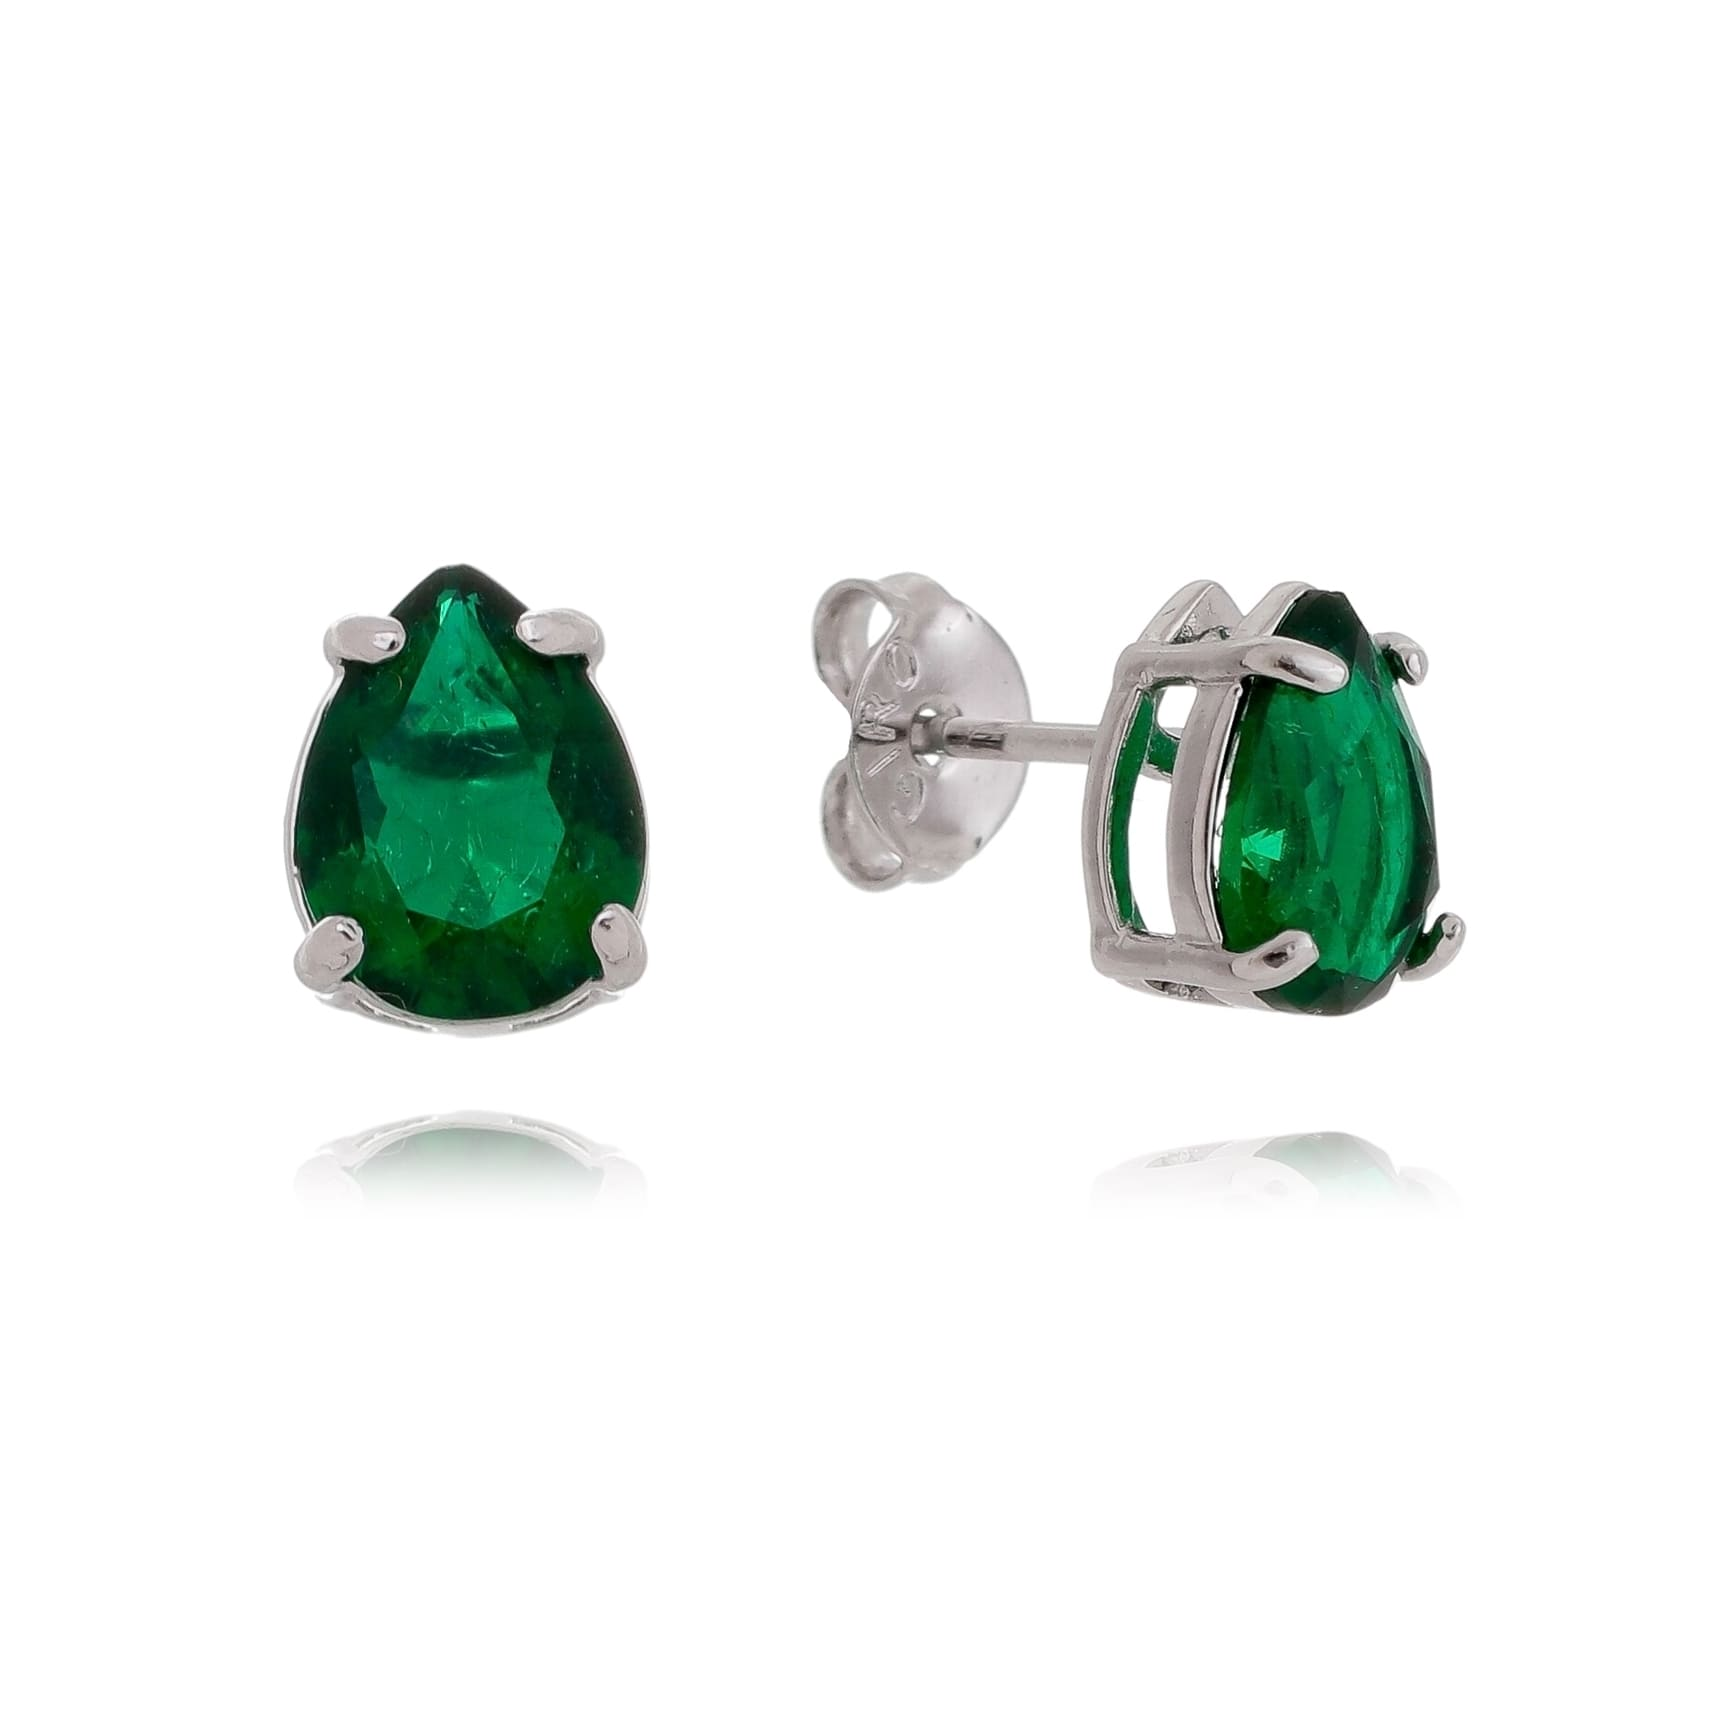 Brinco Gota Pedra Fusion Verde P Folheado em Ródio Branco - Giro Semijoias